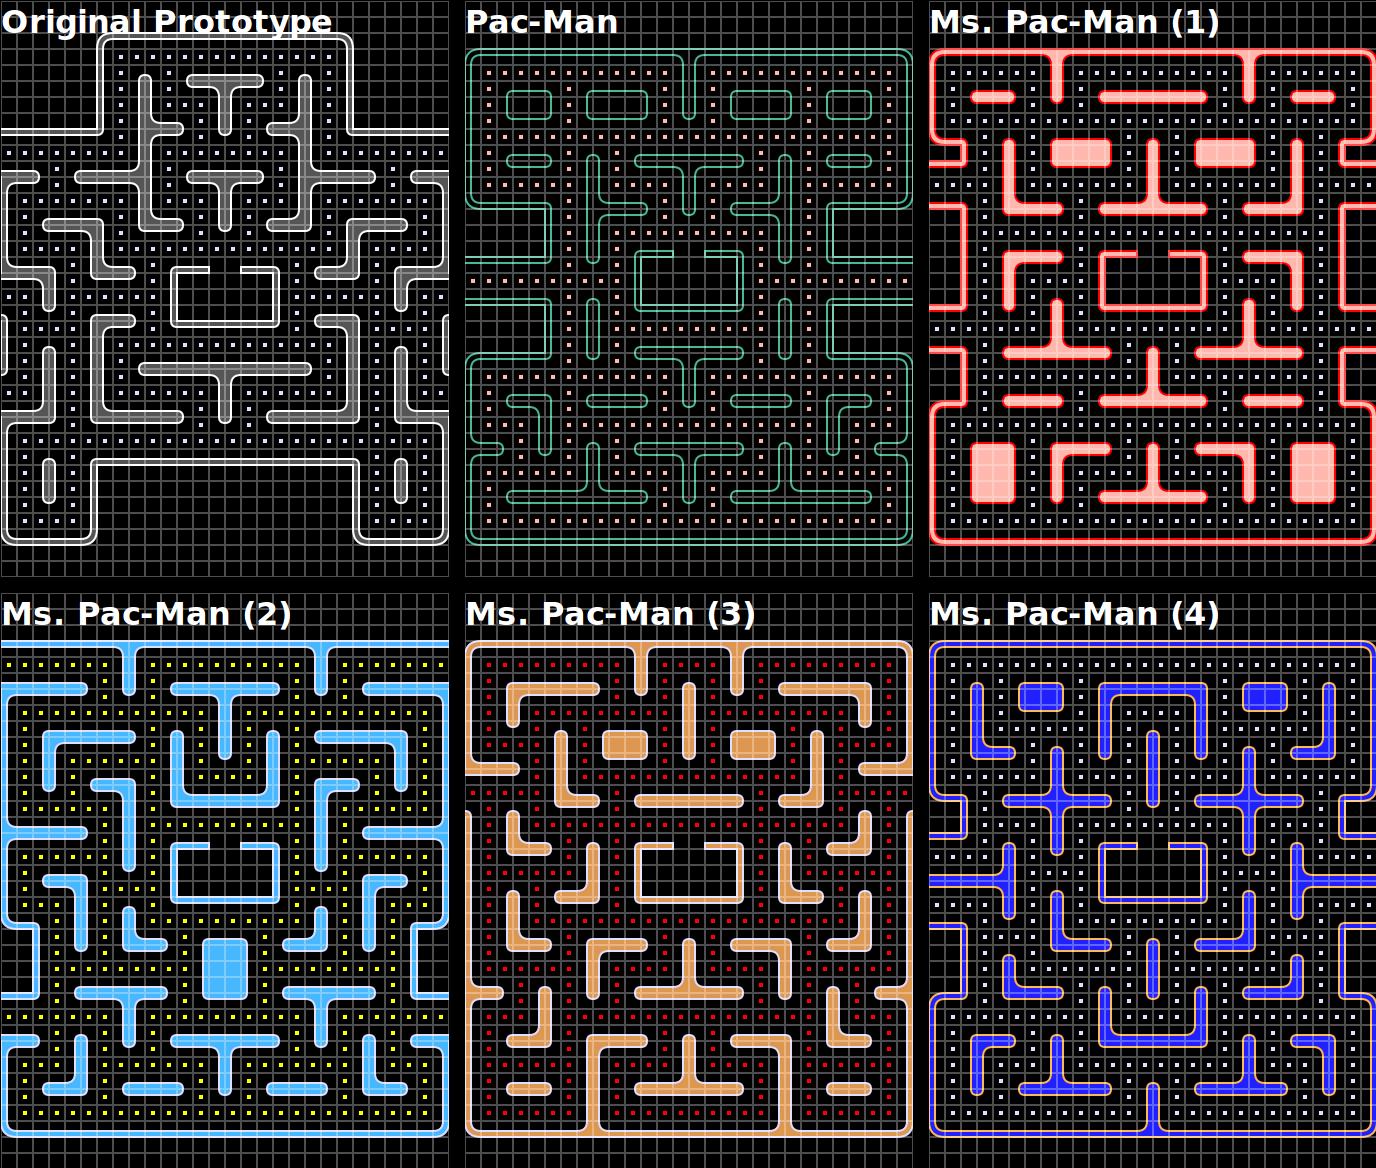 Pac-Man Maze Generation